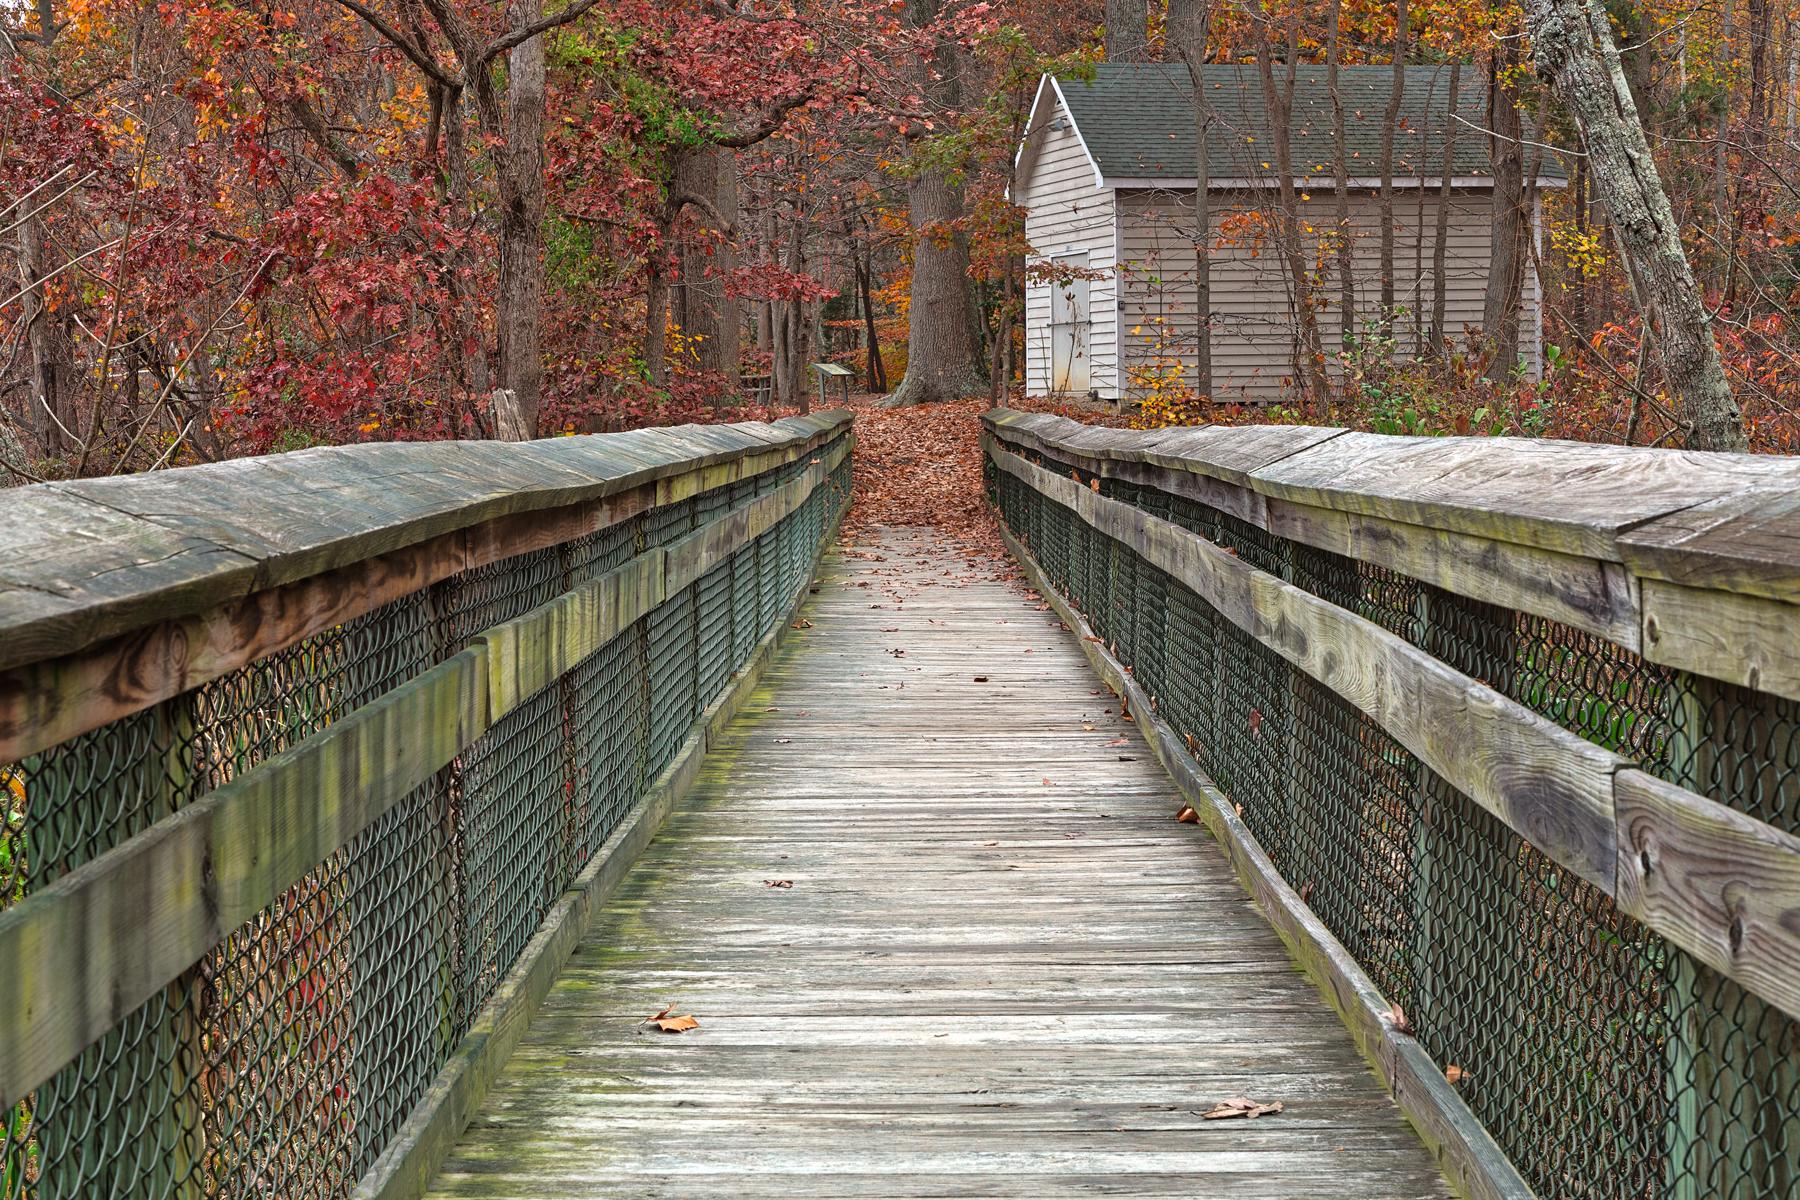 Rustic autumn boardwalk - hdr photo